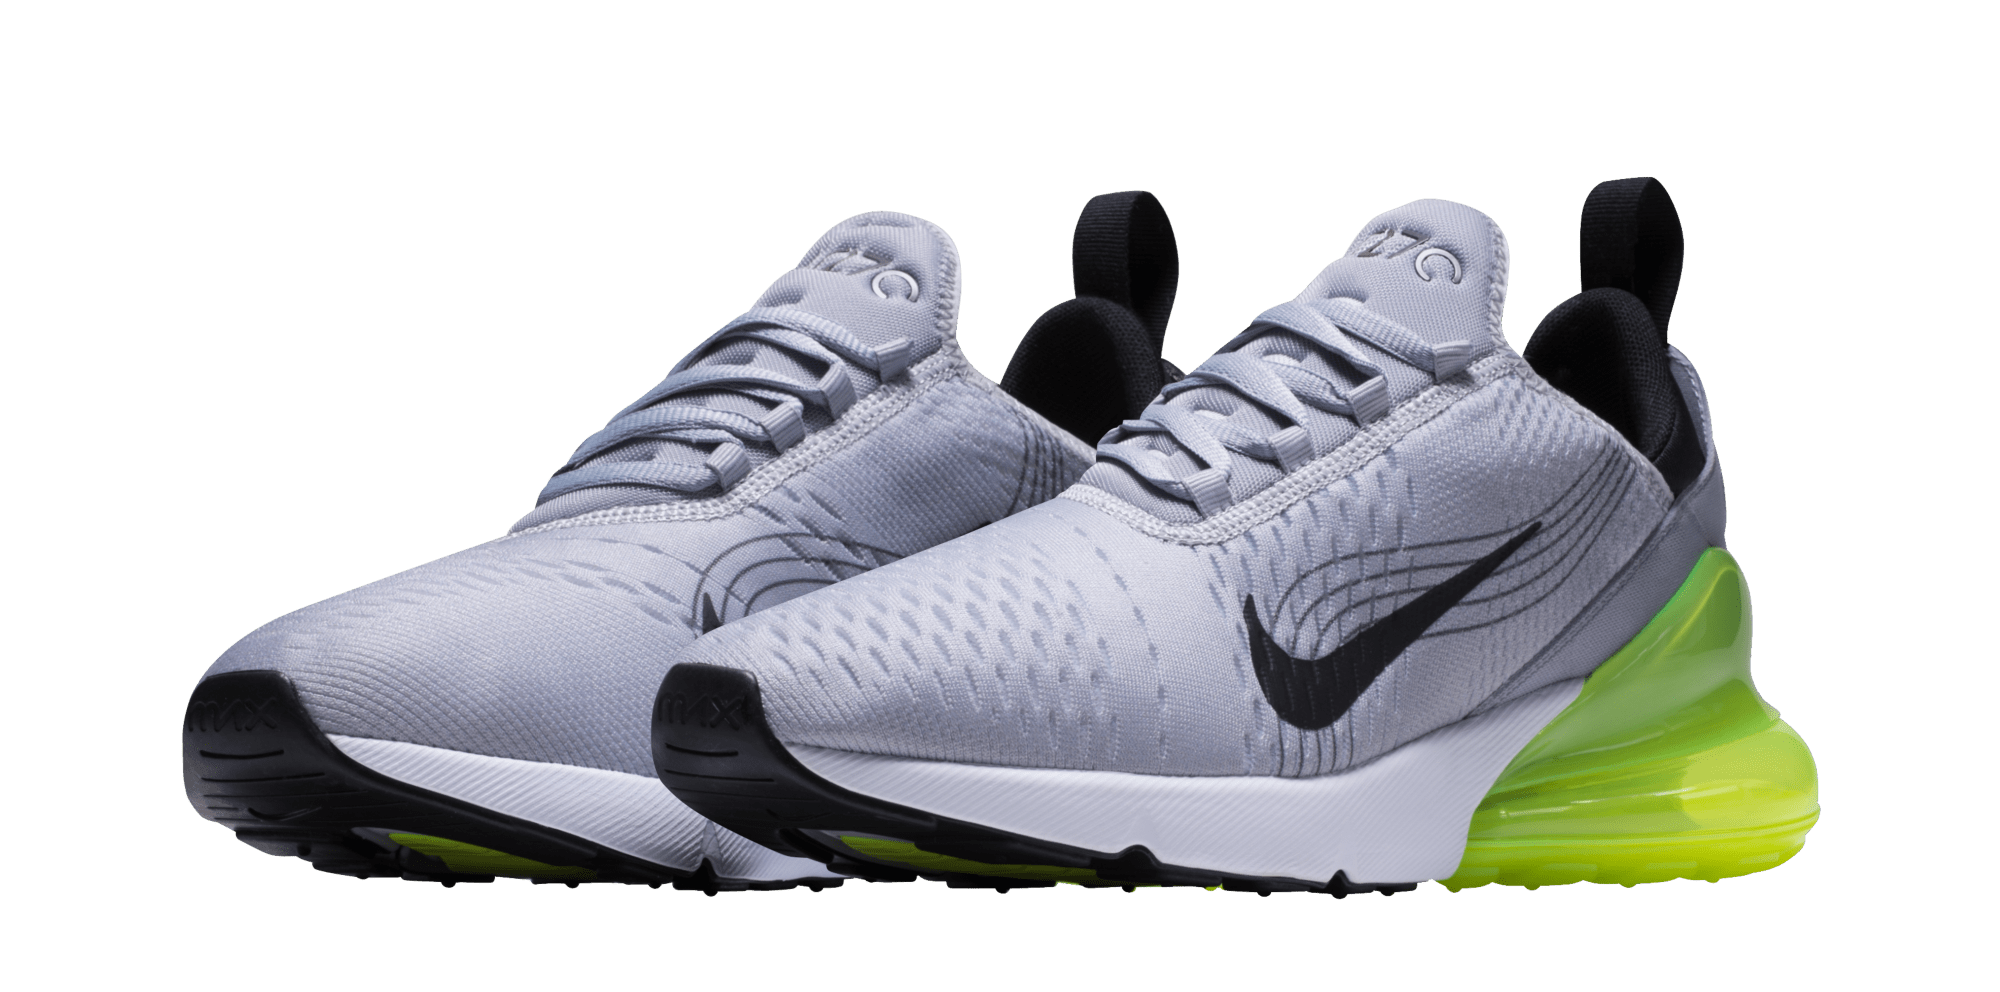 Nike Air Max 270 iD 'Mercurial Vapor' (Pair)